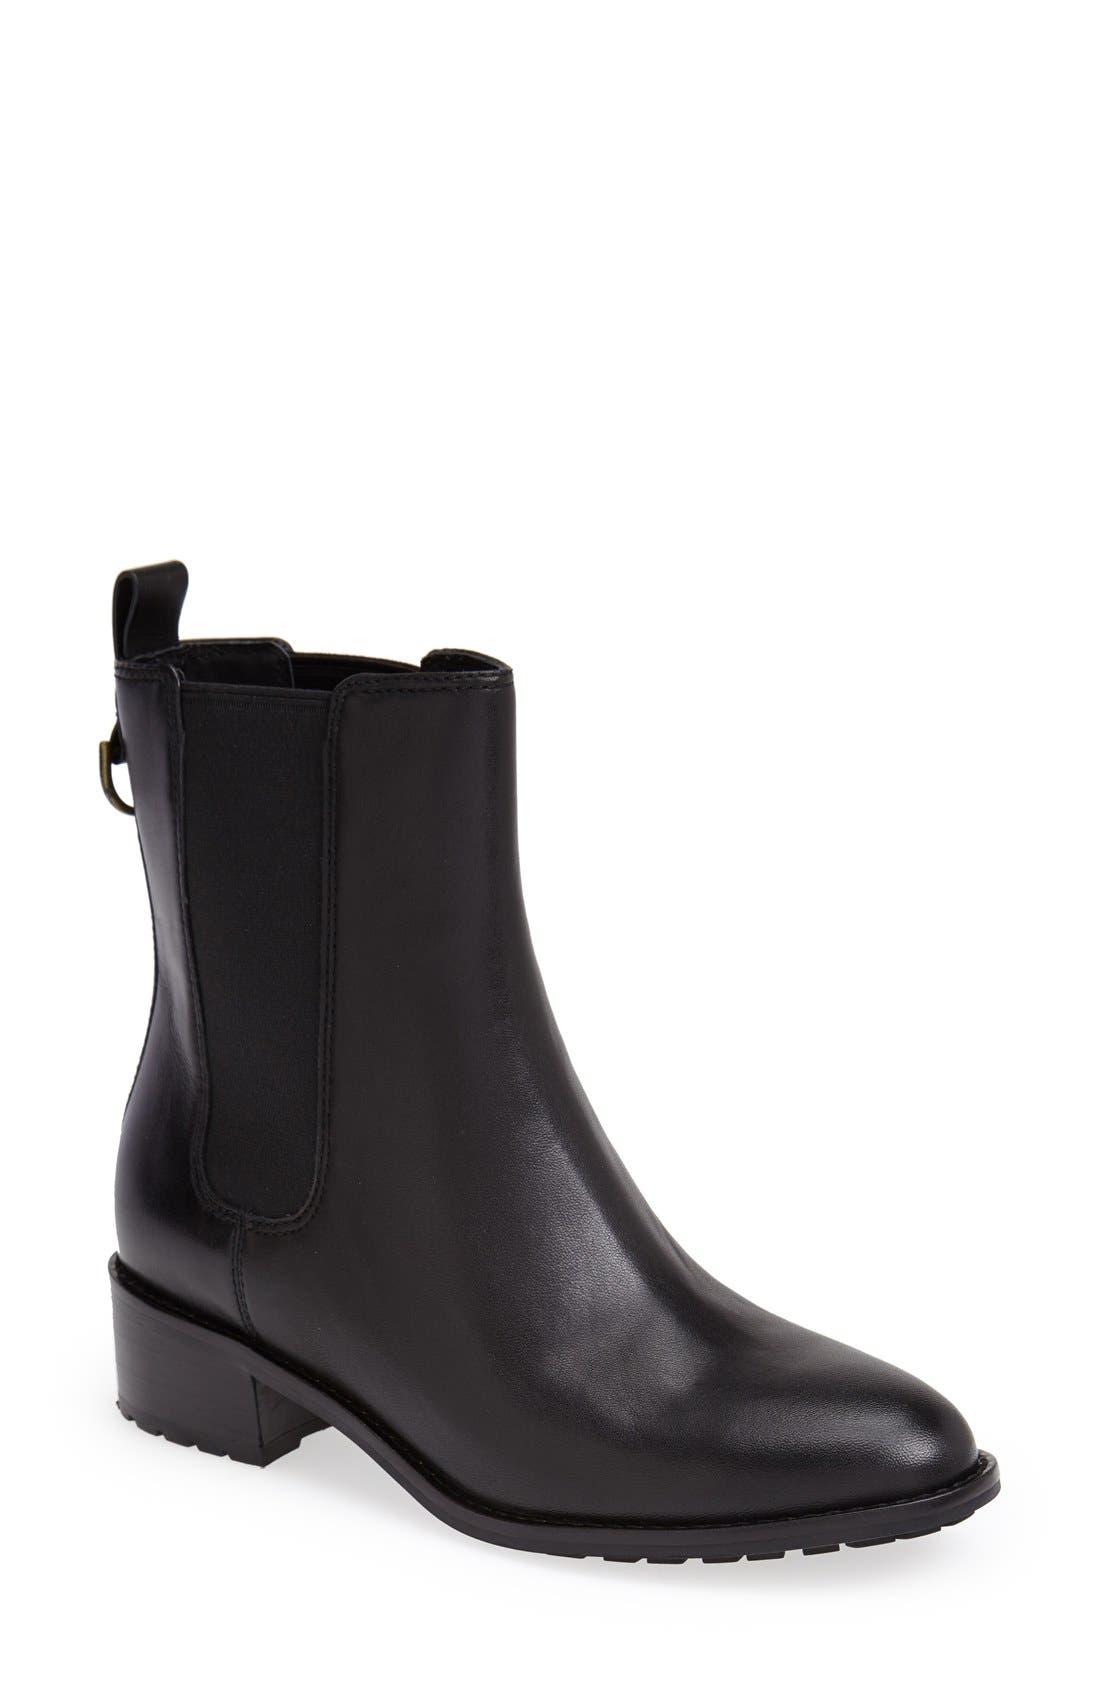 Main Image - Cole Haan 'Daryl' Waterproof Chelsea Boot (Women)